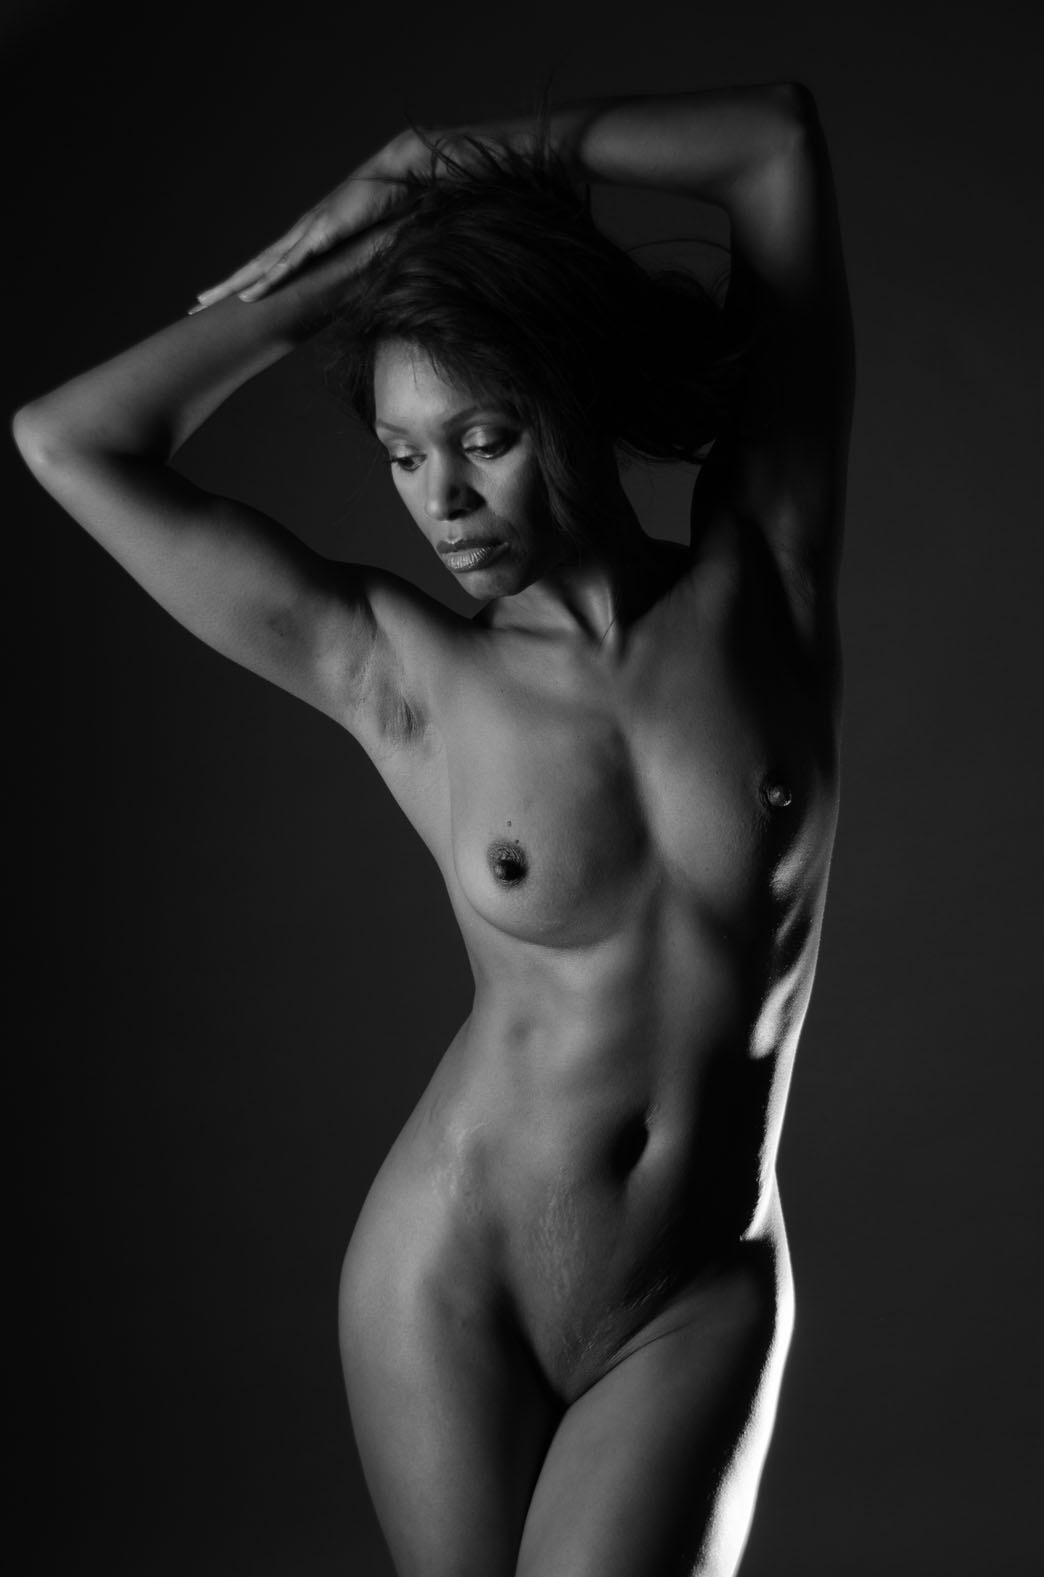 Natasha by Mike Bolton